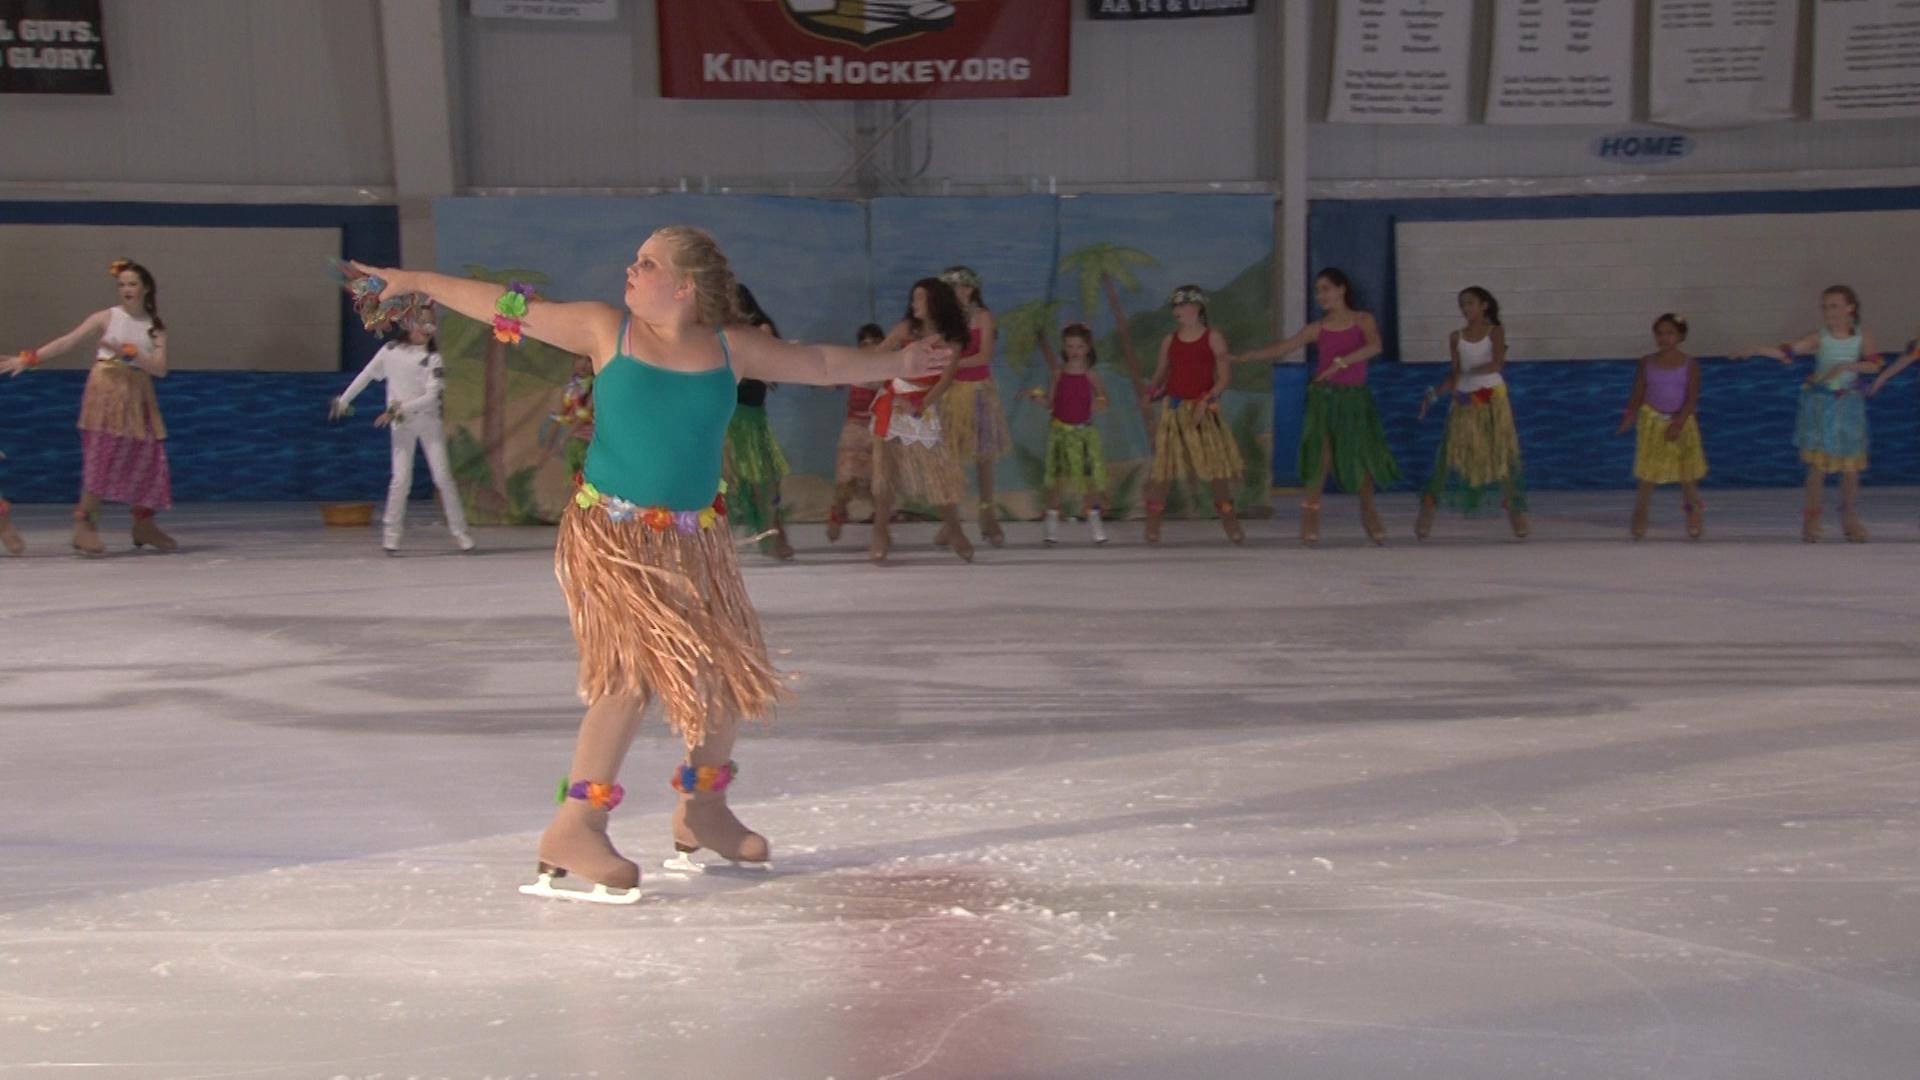 Power Play Maui Skate on Ice 071417.00_12_54_19.Still021.jpg